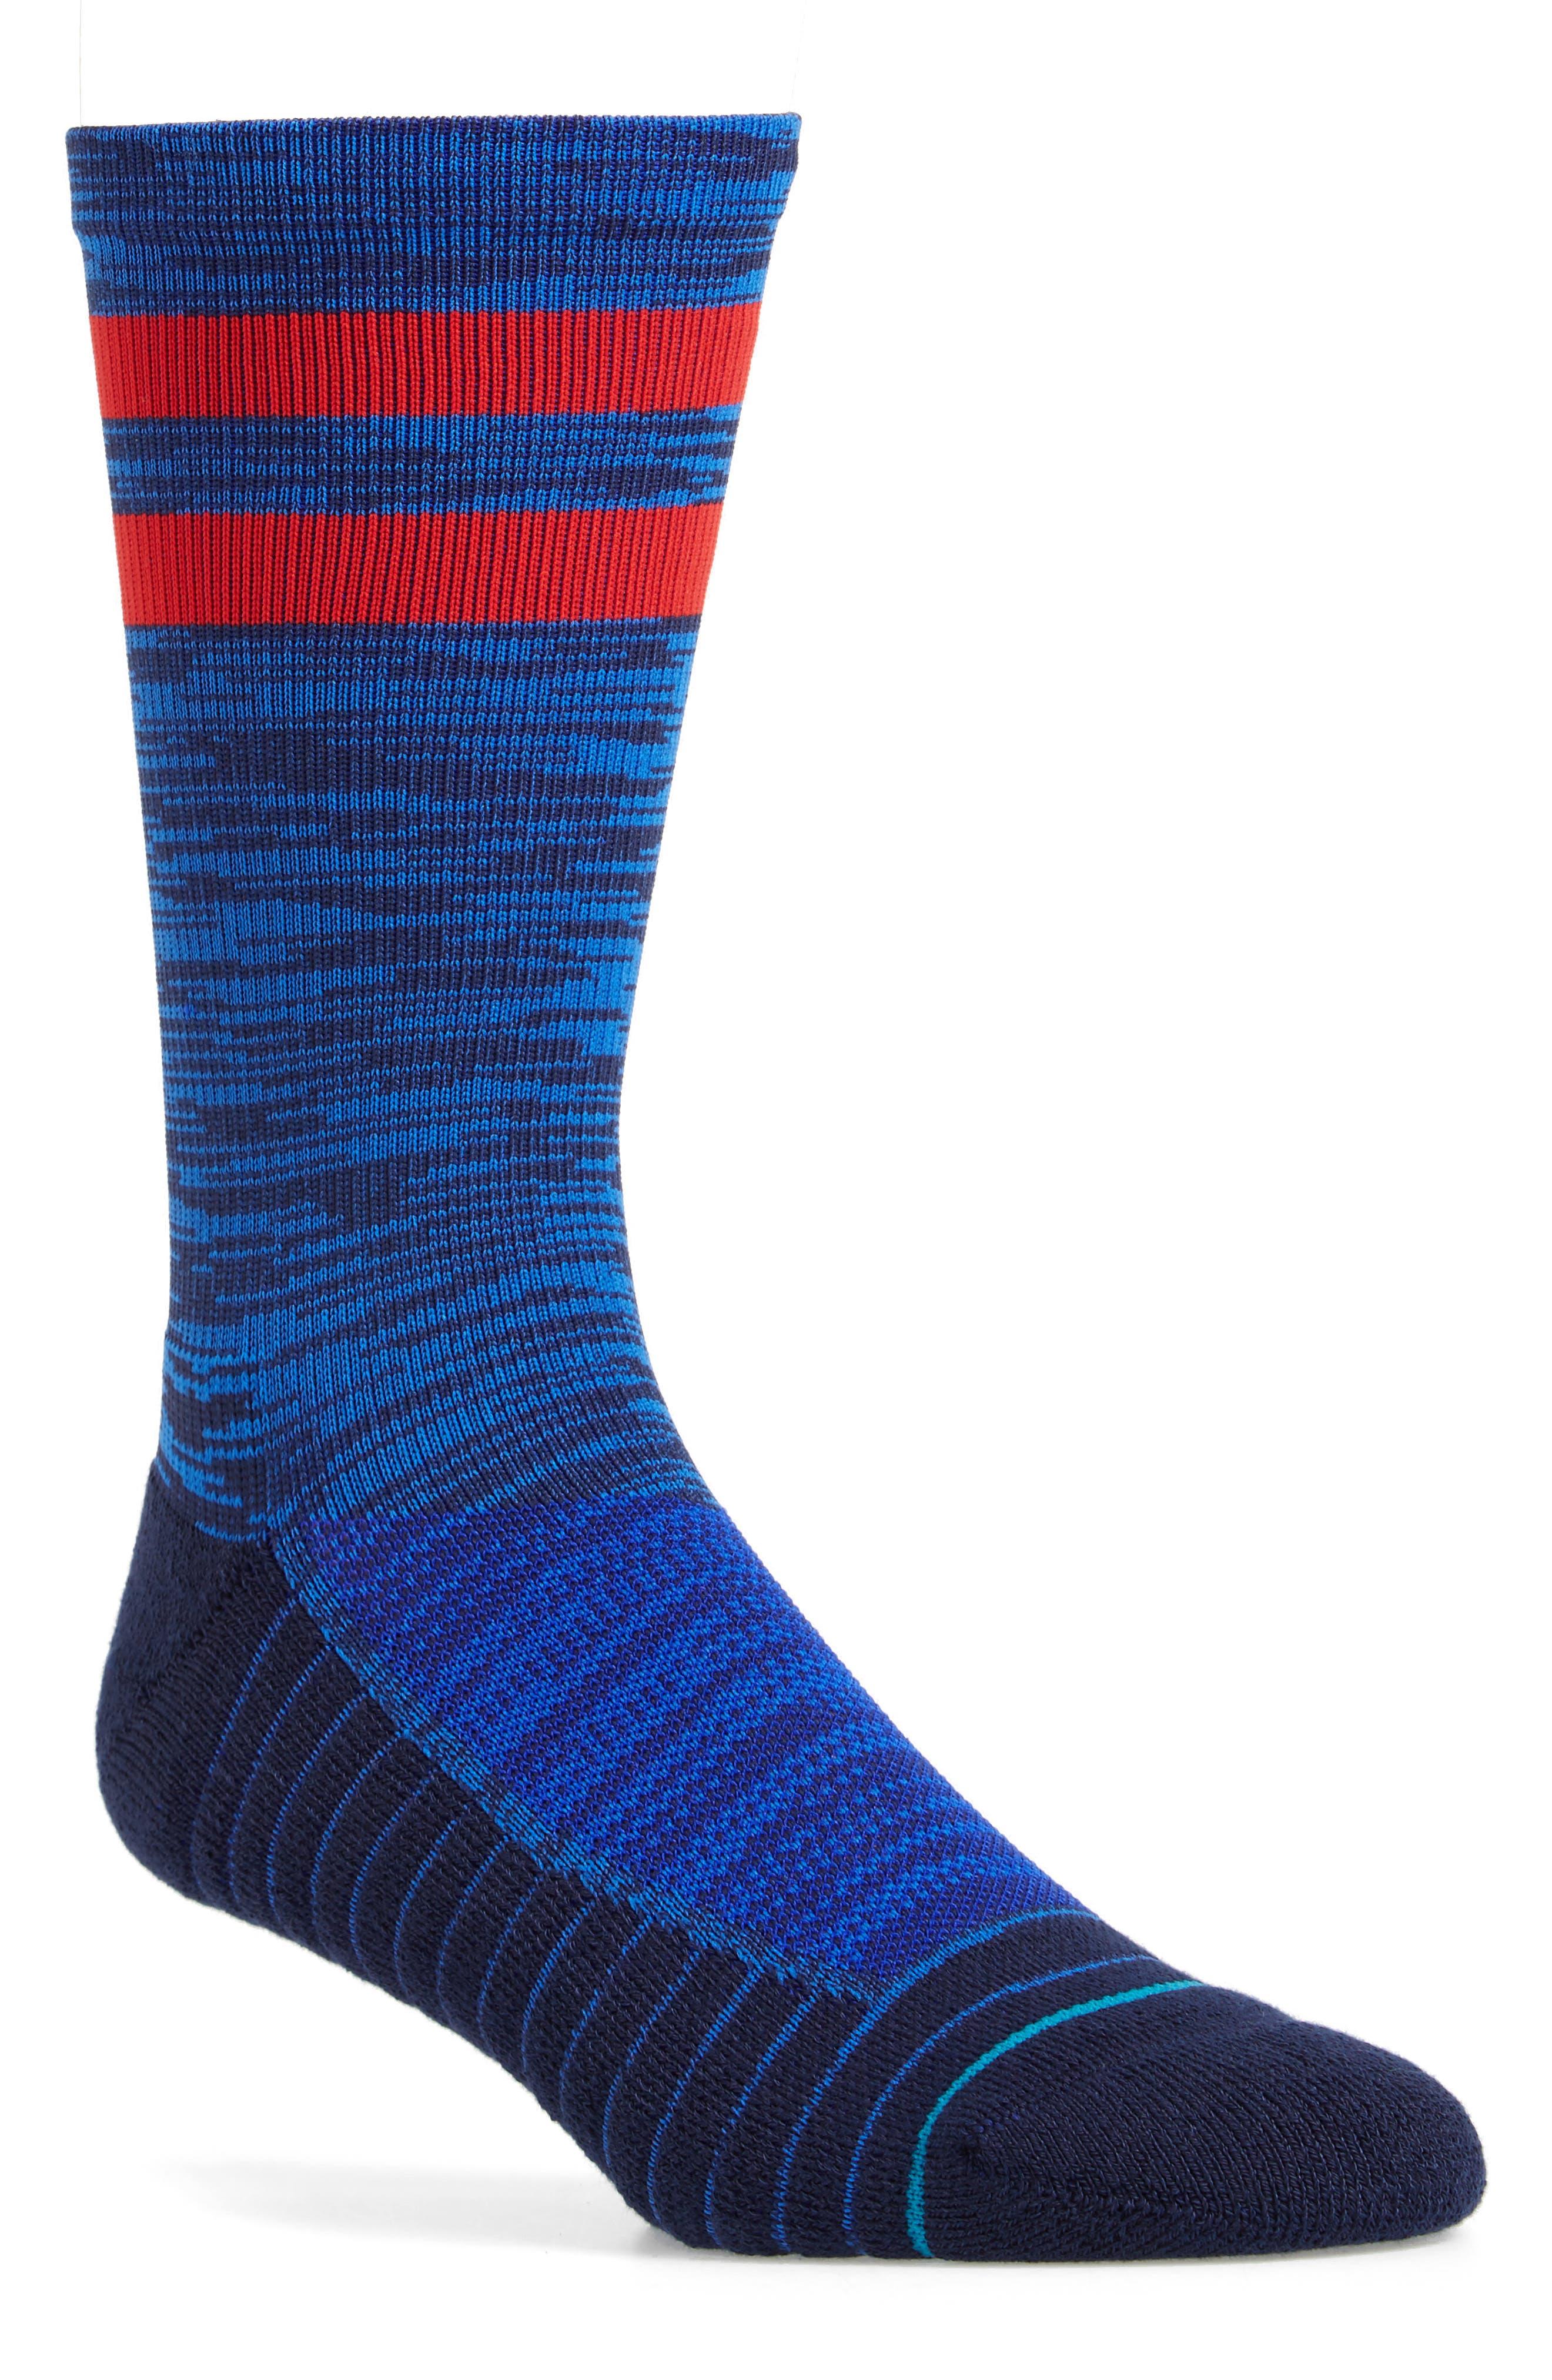 Stance Athletic Franchise Crew Socks